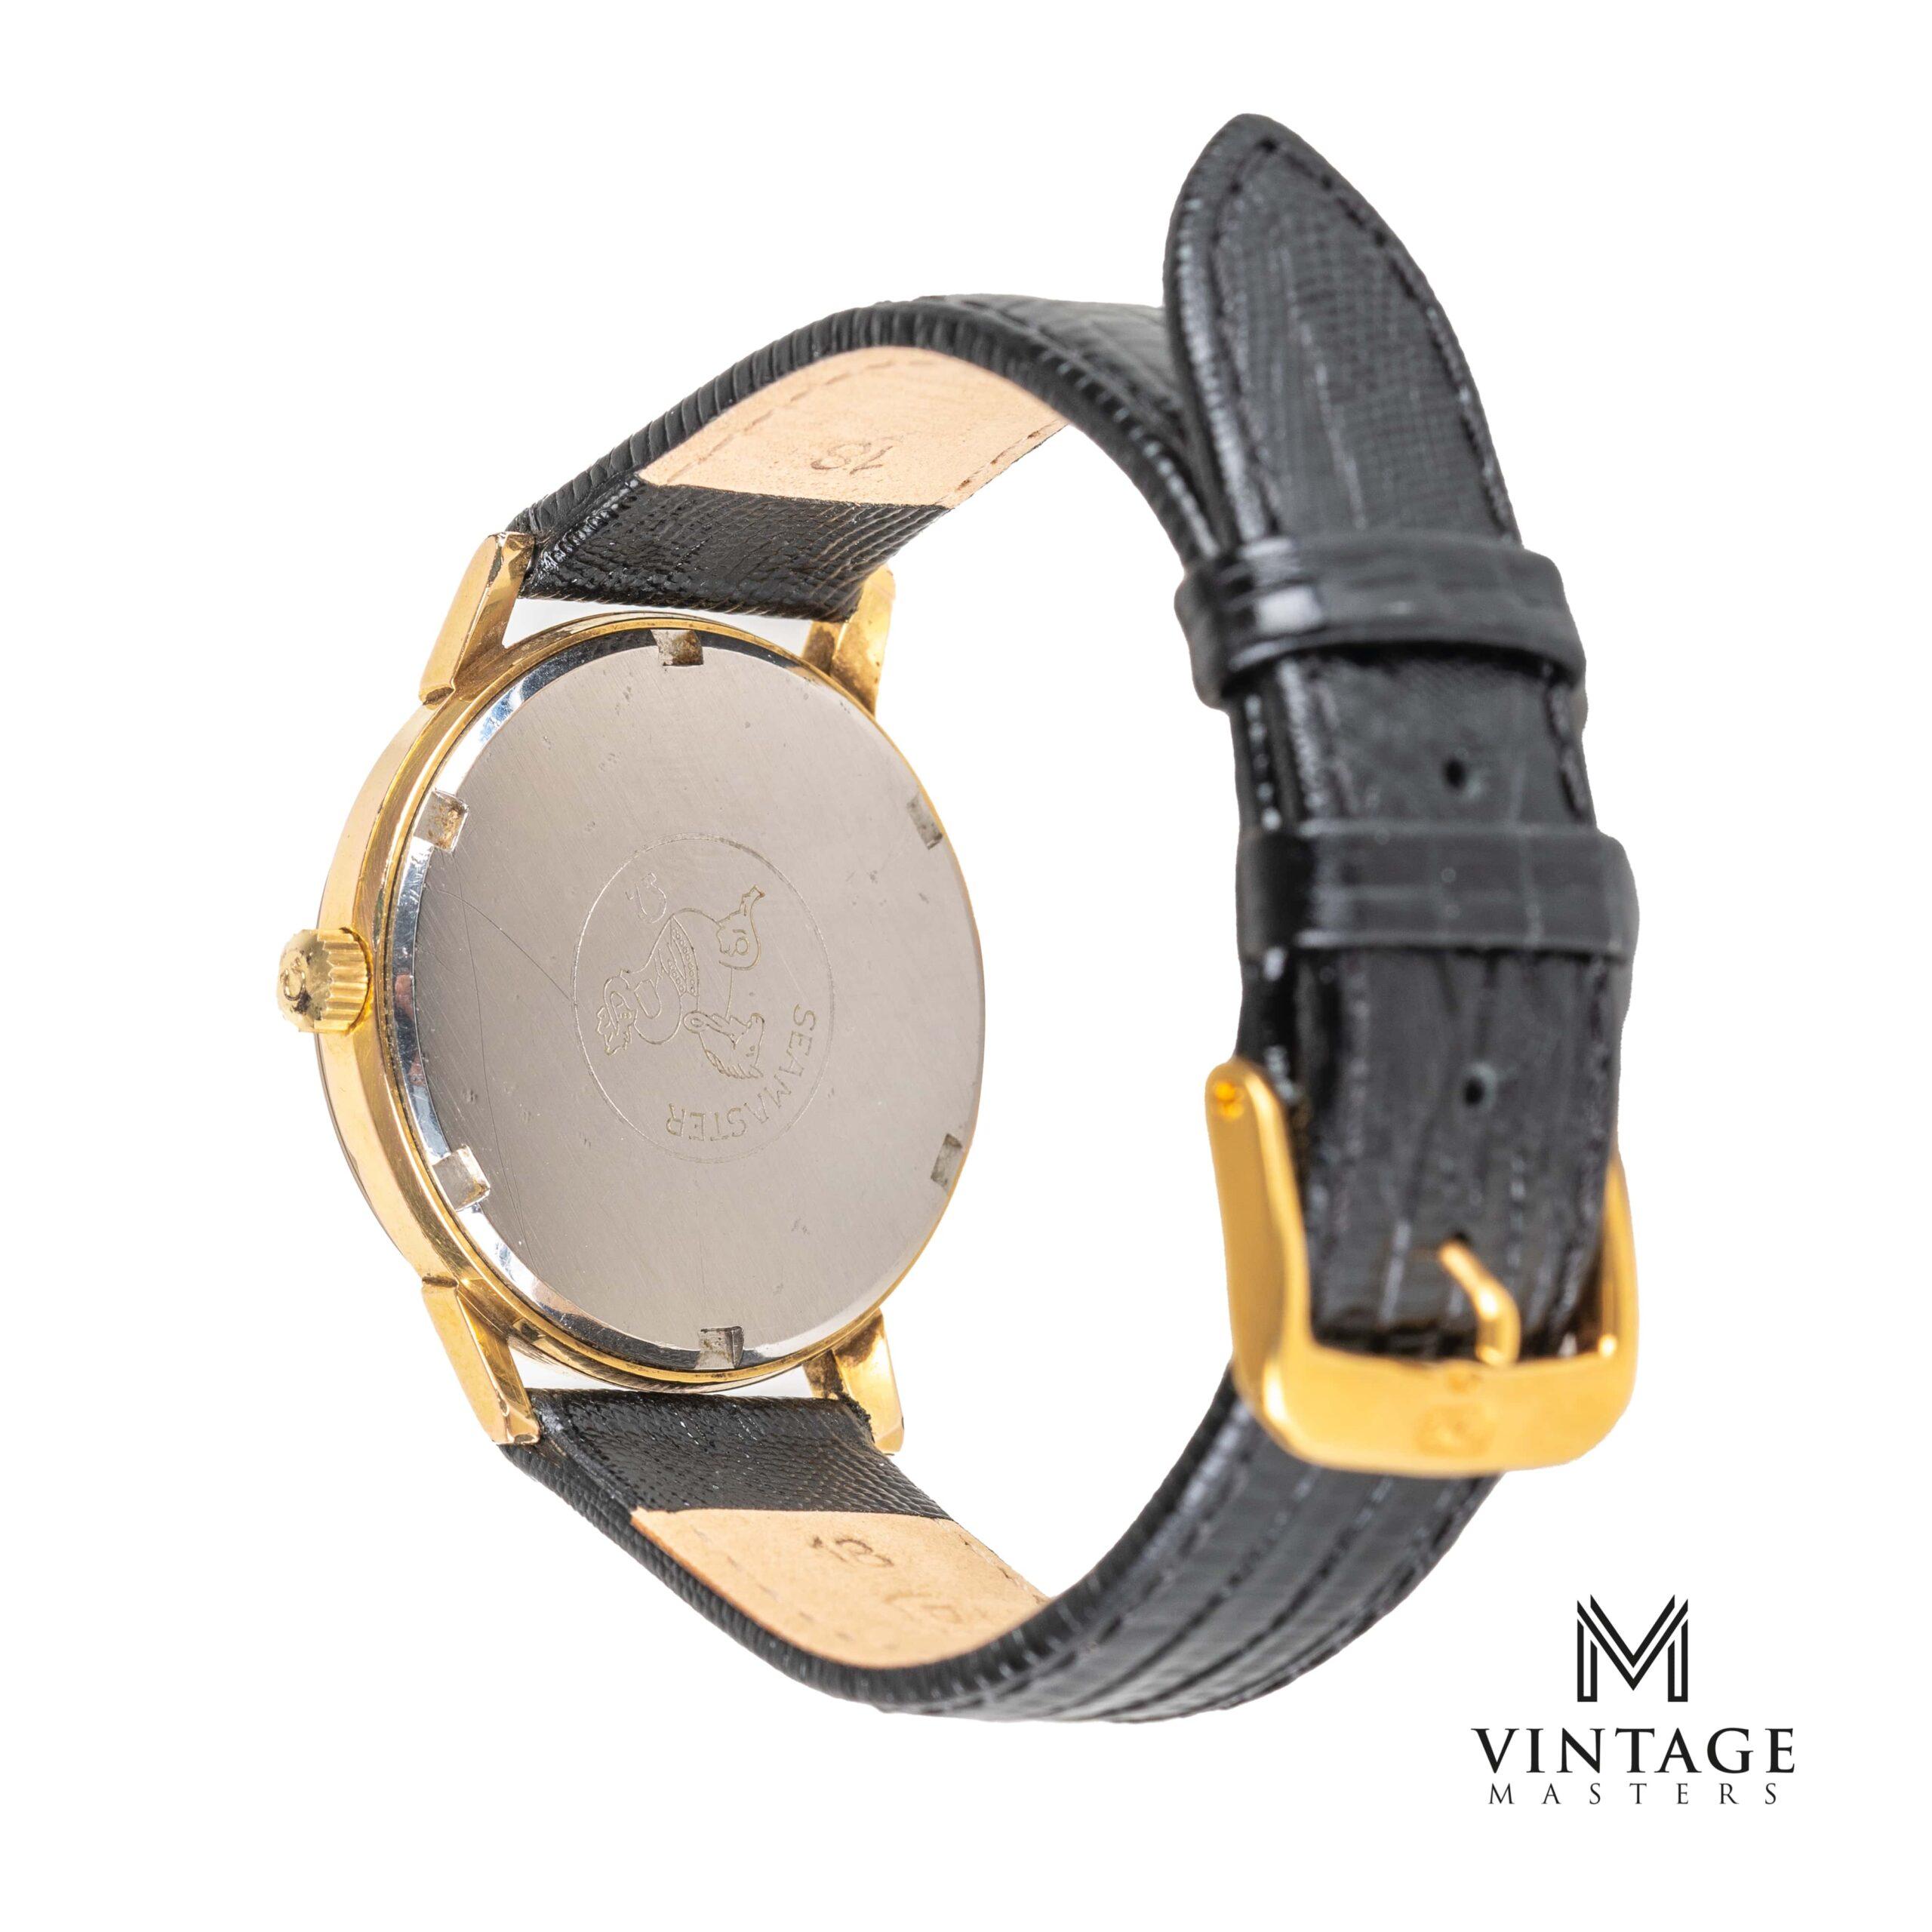 vintage omega seamaster 600 watch 136.011 1965 caseback